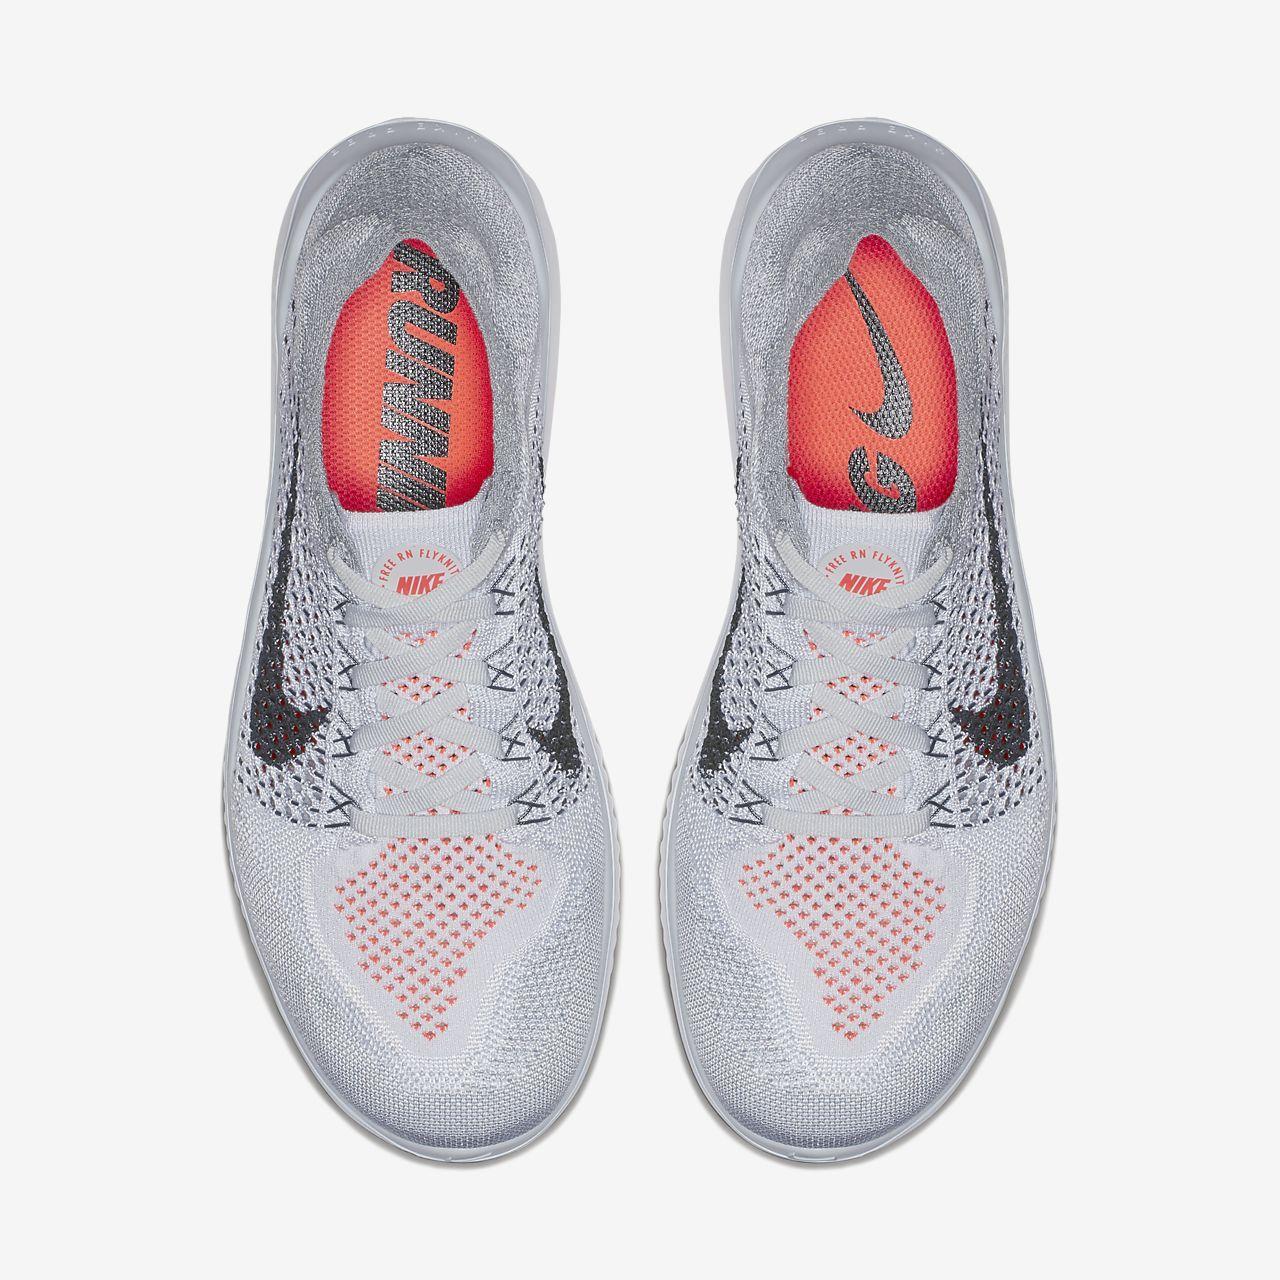 bbb03acb233 Nike Free RN Flyknit 2018 Men s Running Shoe